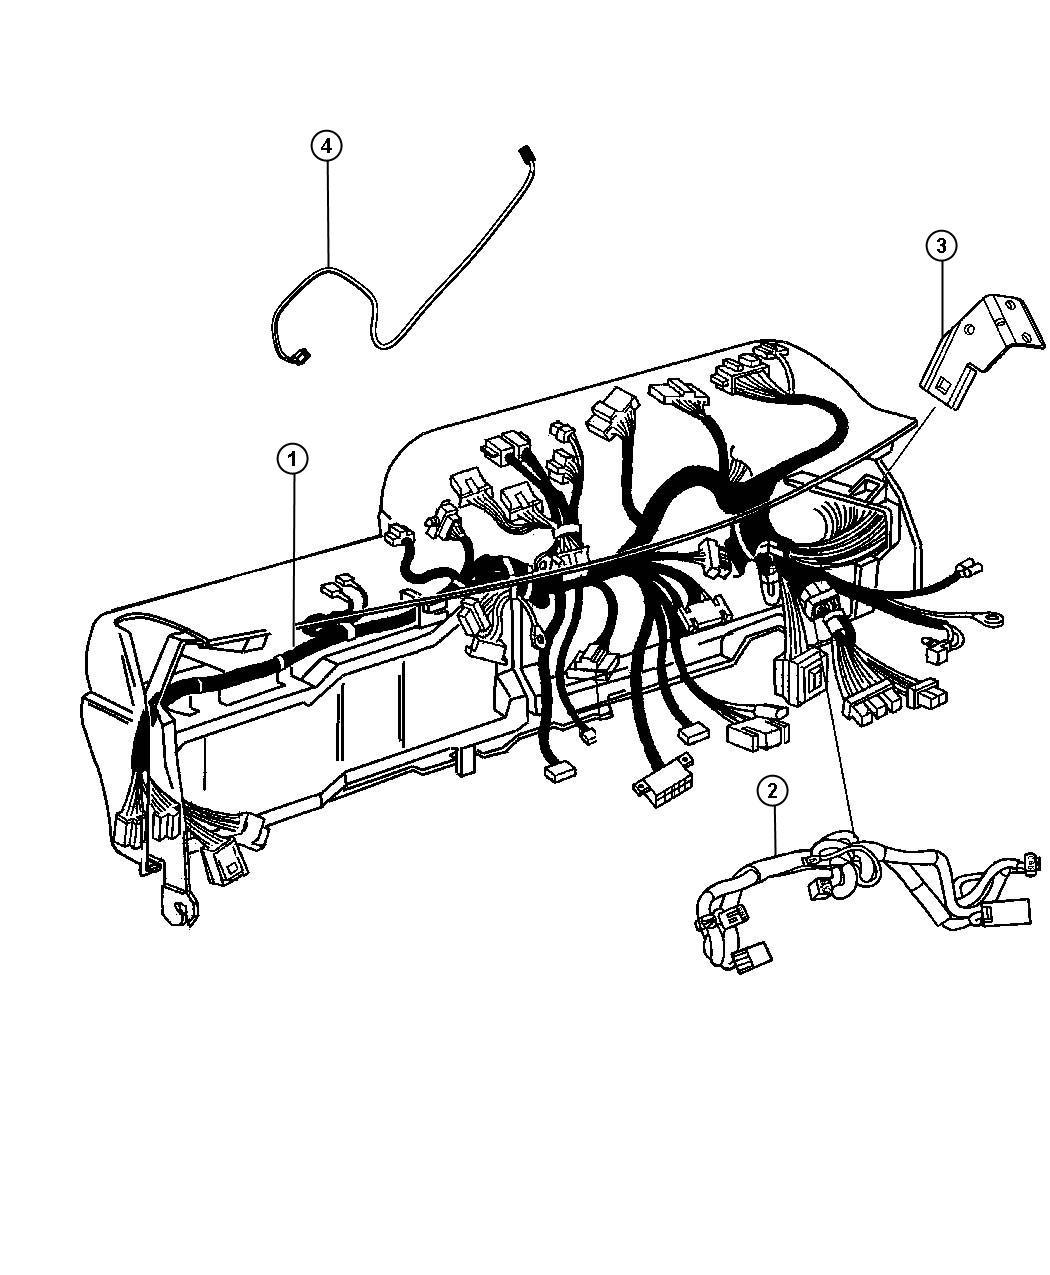 2012 Dodge Ram 3500 Wiring. Instrument panel. [air